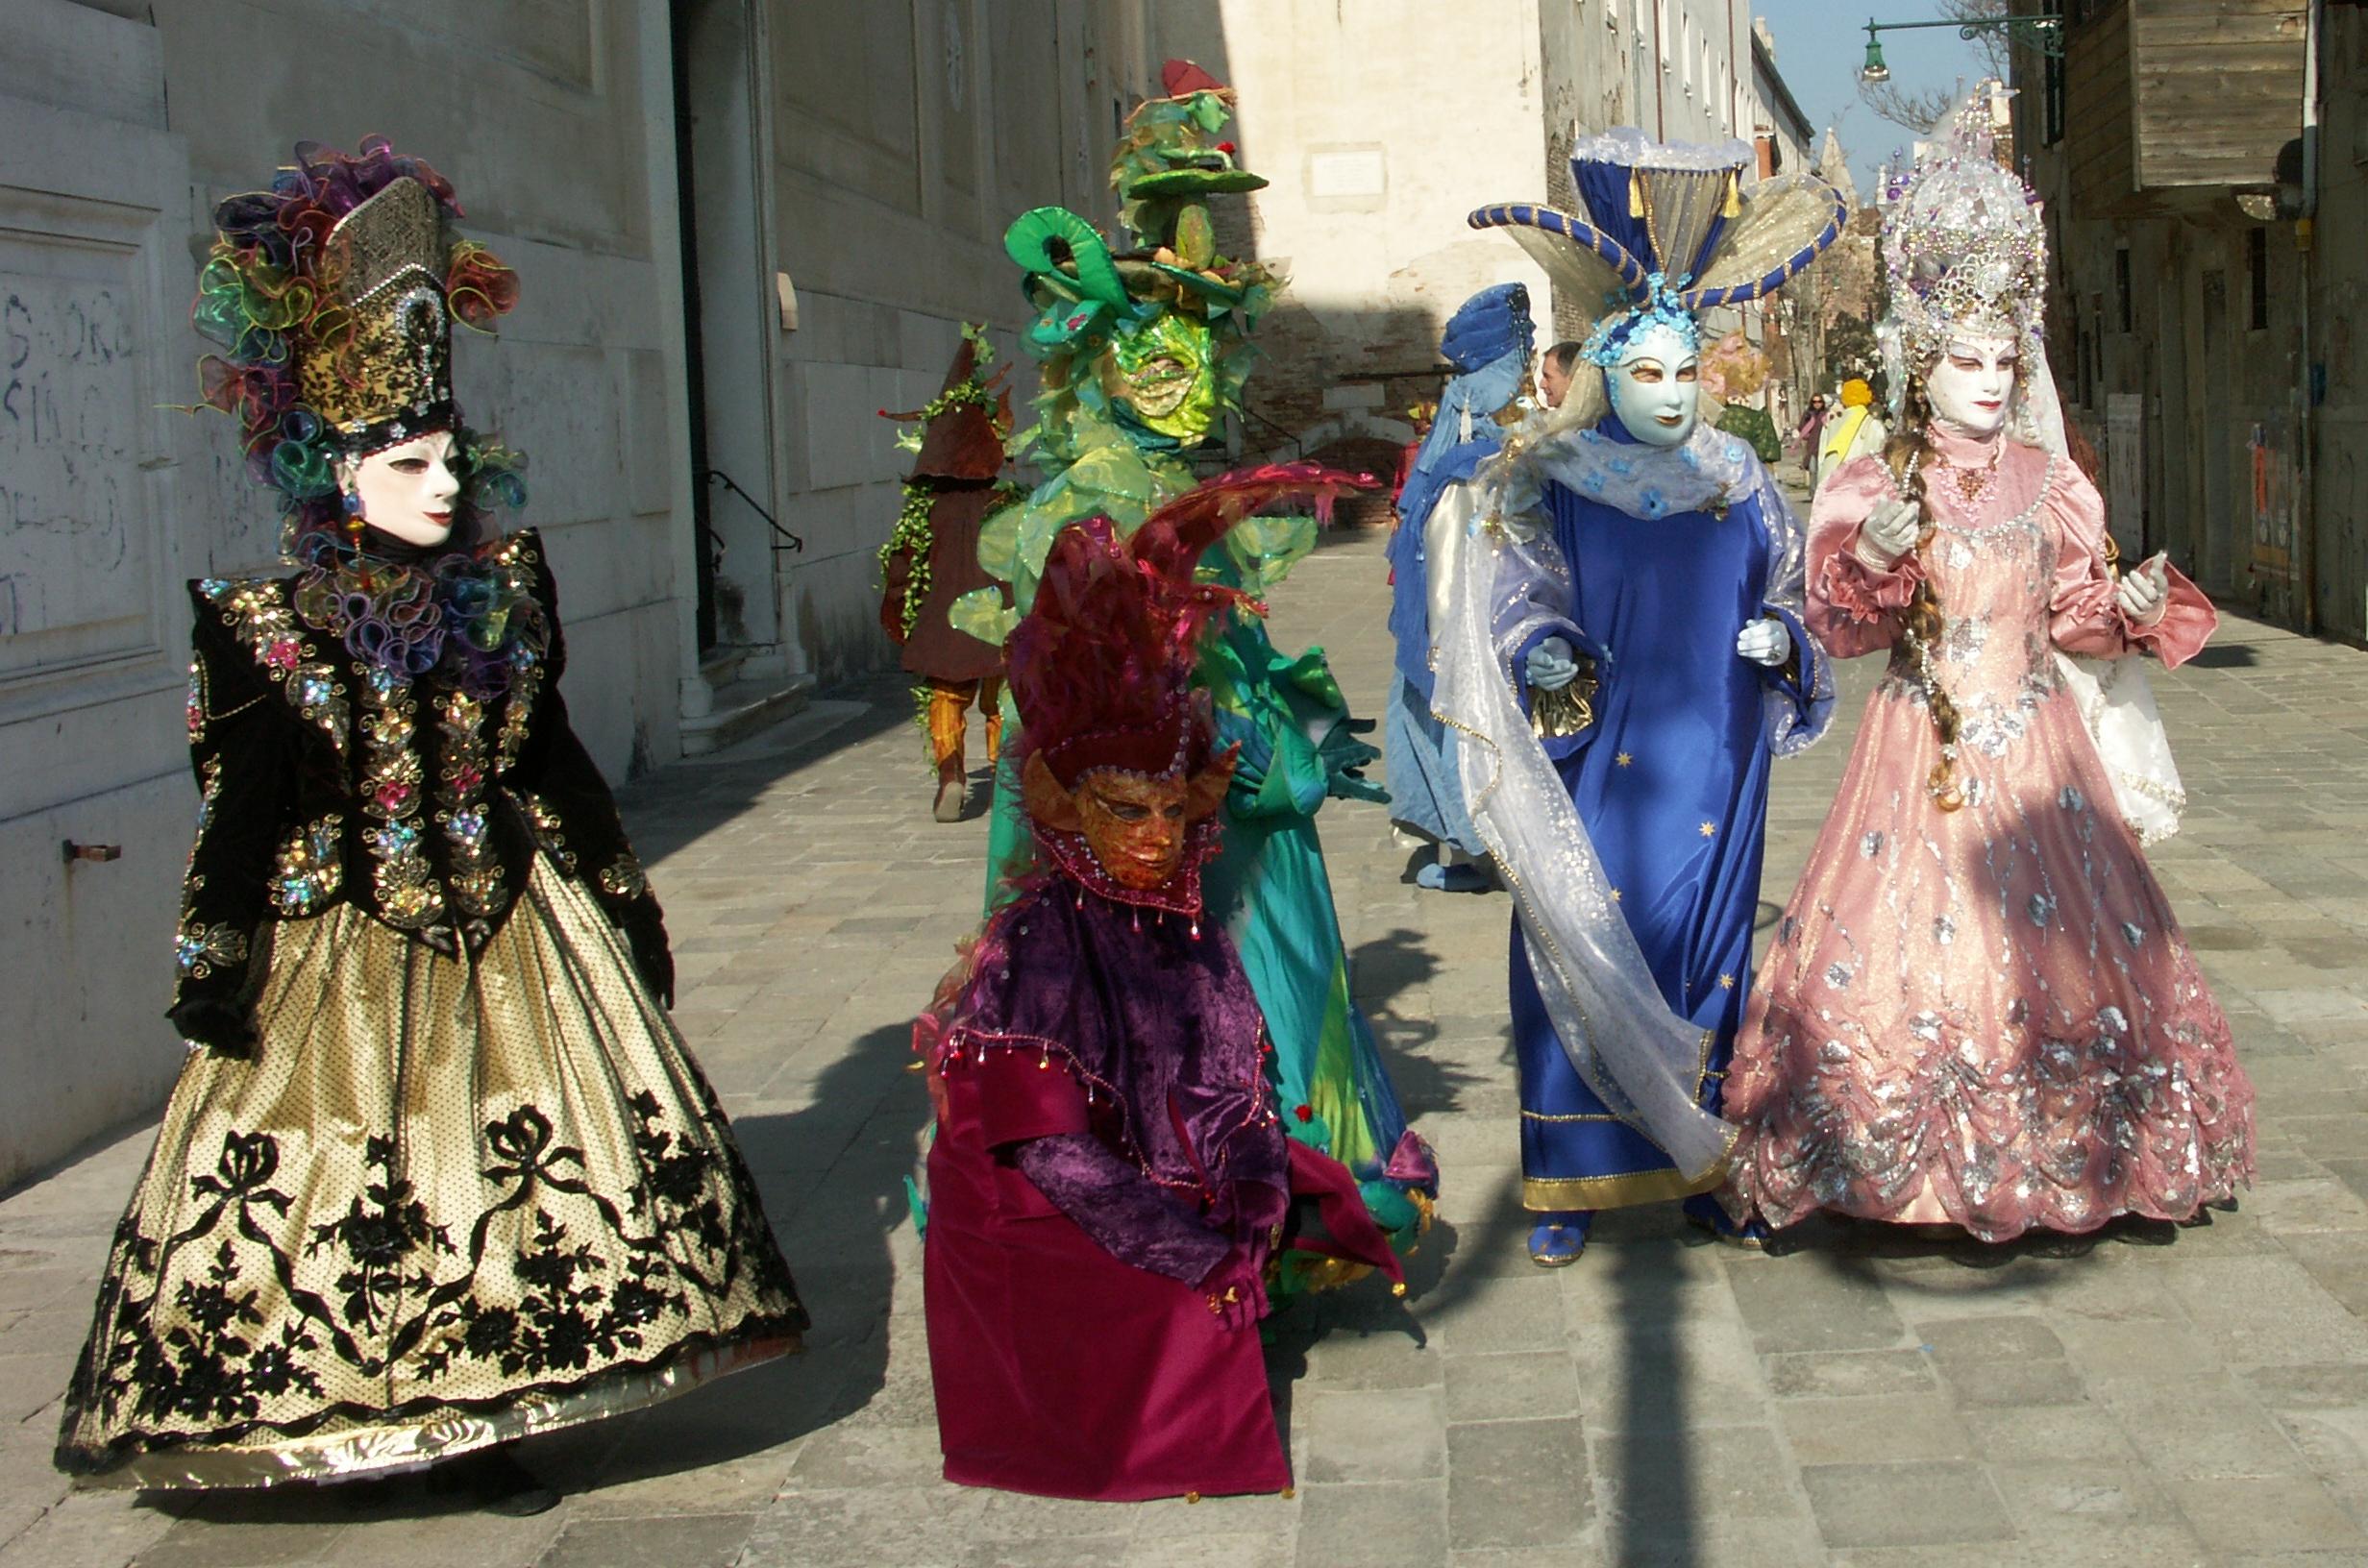 http://upload.wikimedia.org/wikipedia/commons/2/28/Maschere_carnevale_venezia.JPG